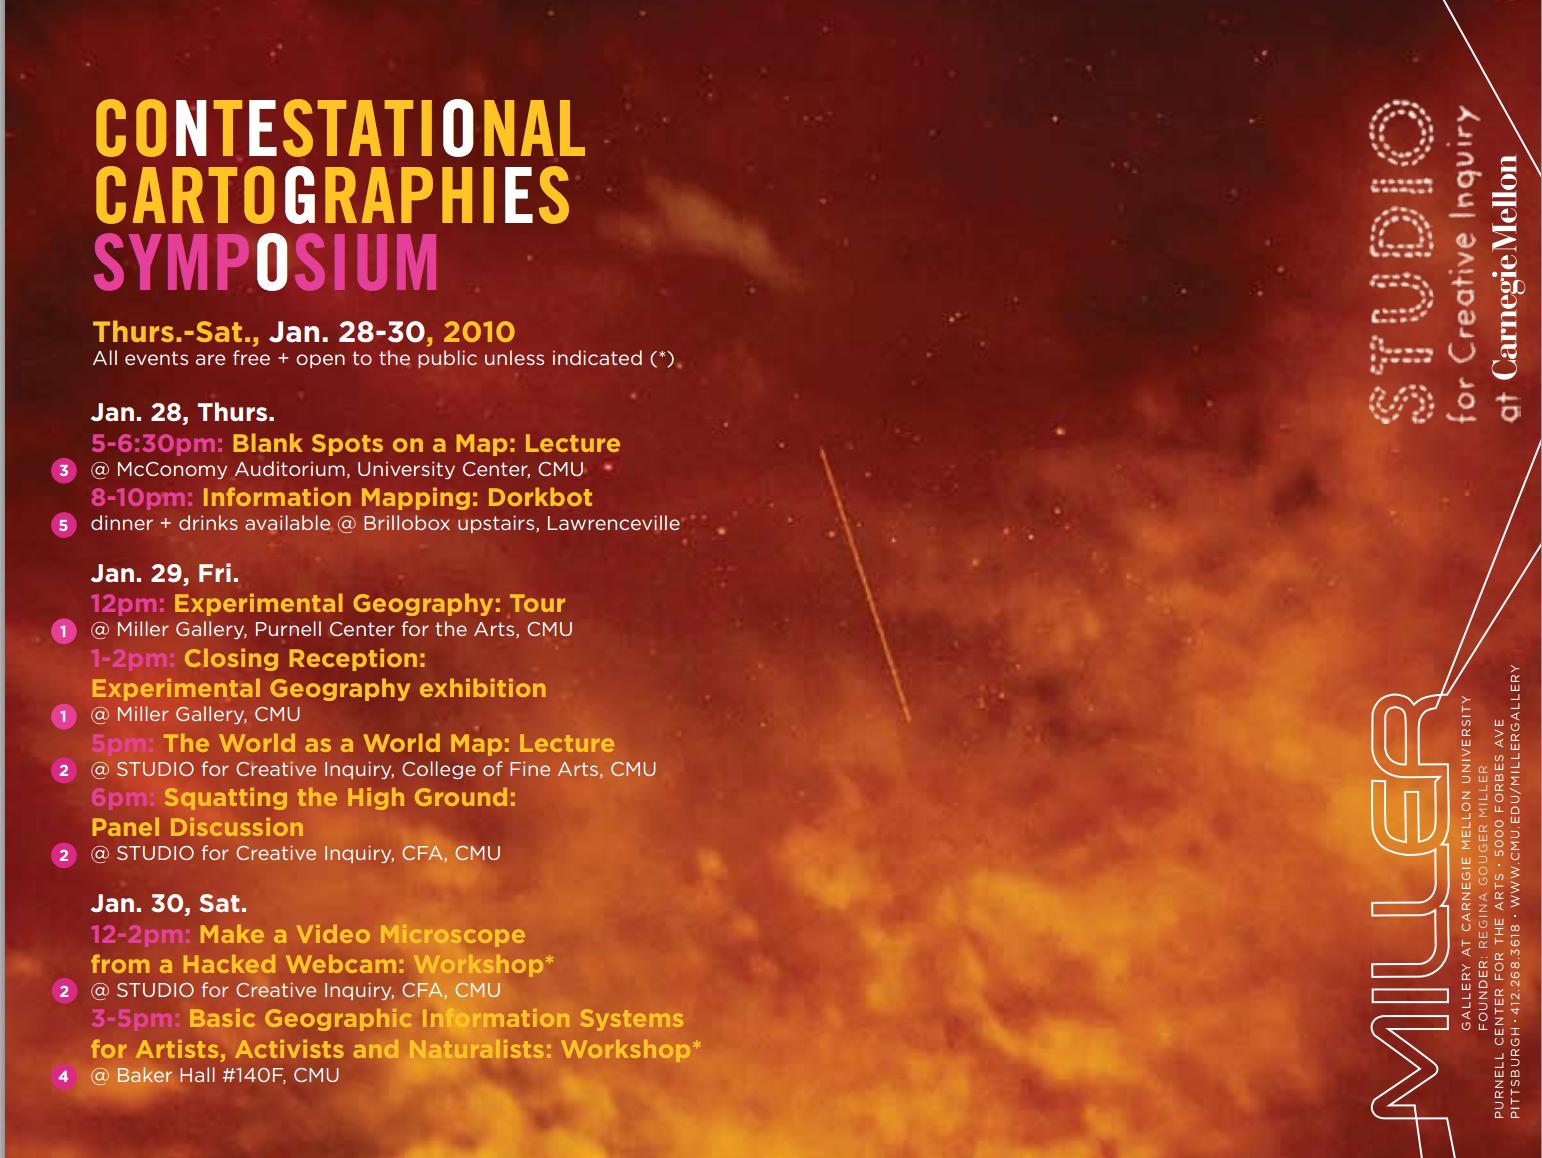 Contestational Cartographies brochure